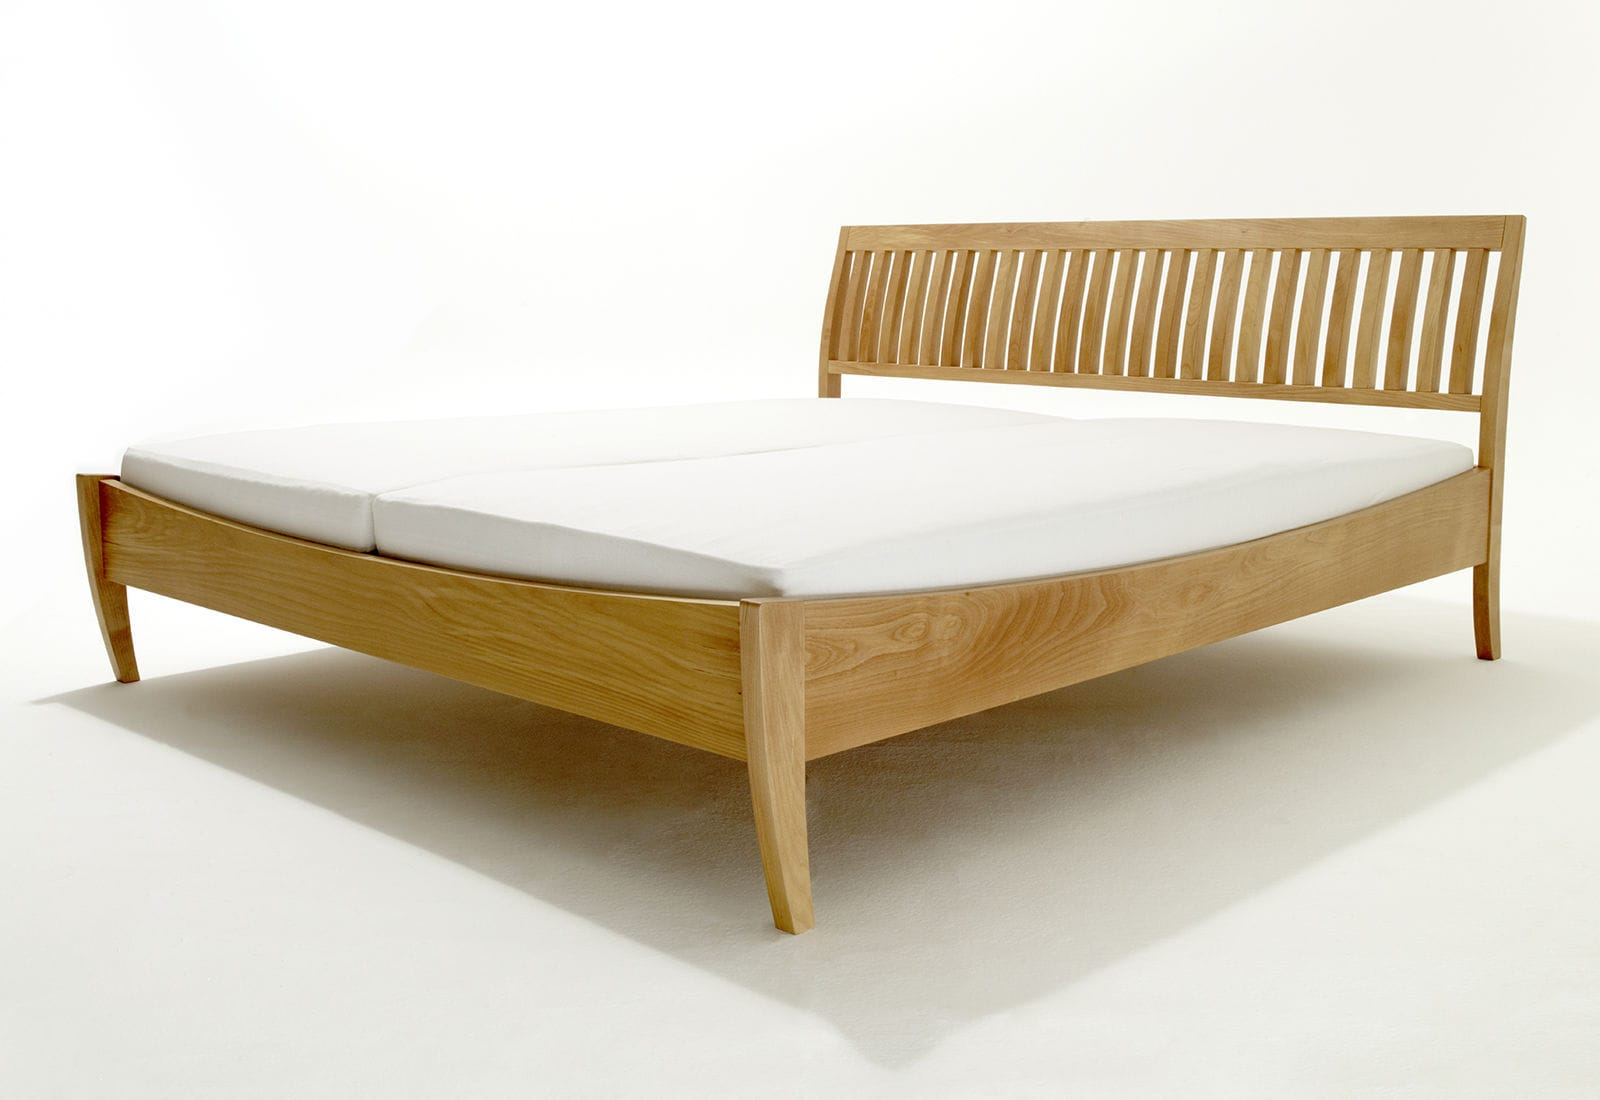 Full Size of Bett Rückwand Holz Doppelbett Zebra Sixay Furniture Modern Kopfteil Betten Mit Aufbewahrung Amerikanisches 200x200 Komforthöhe Ottoversand Stauraum Für Wohnzimmer Bett Rückwand Holz